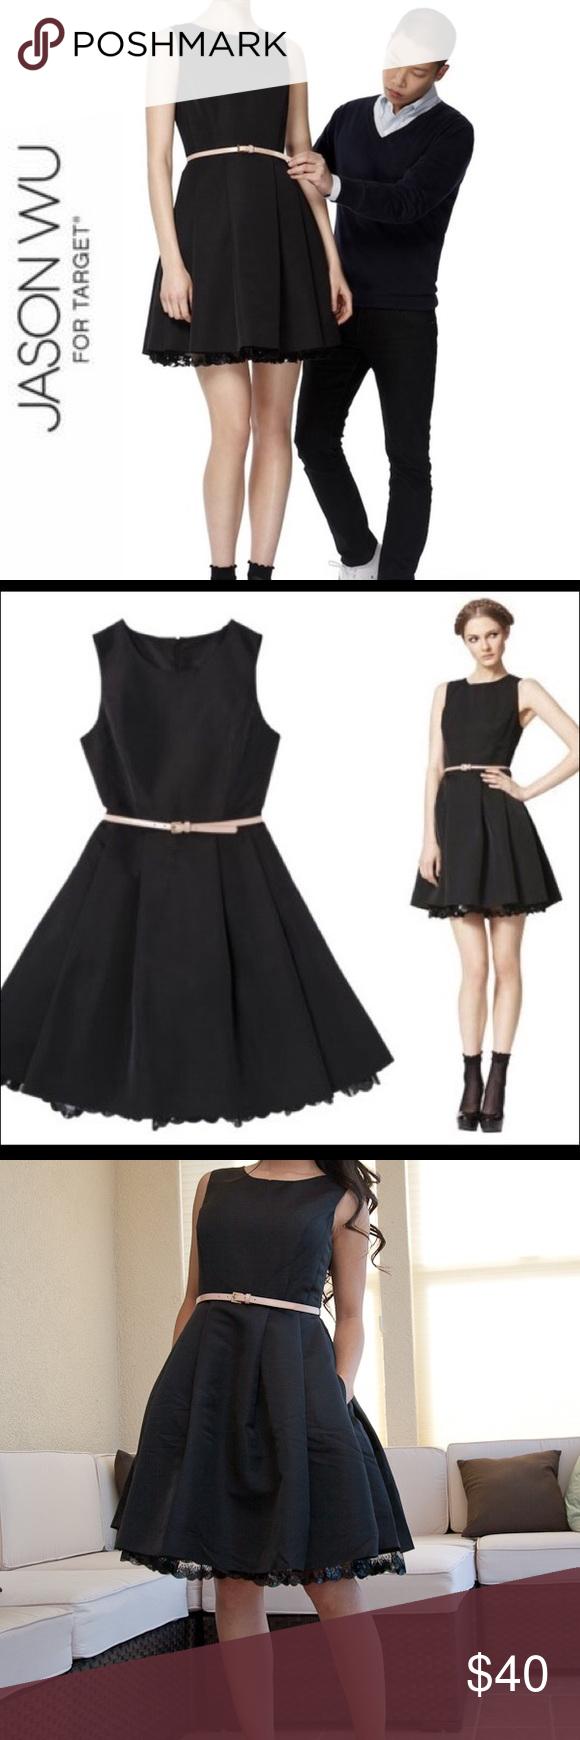 Jason Wu For Target Fit And Flare Black Dress Jason Wu Limited Edition For Target Dress Lined With Bottom Lace Hem B Fit And Flare Jason Wu Dress Black Dress [ 1740 x 580 Pixel ]